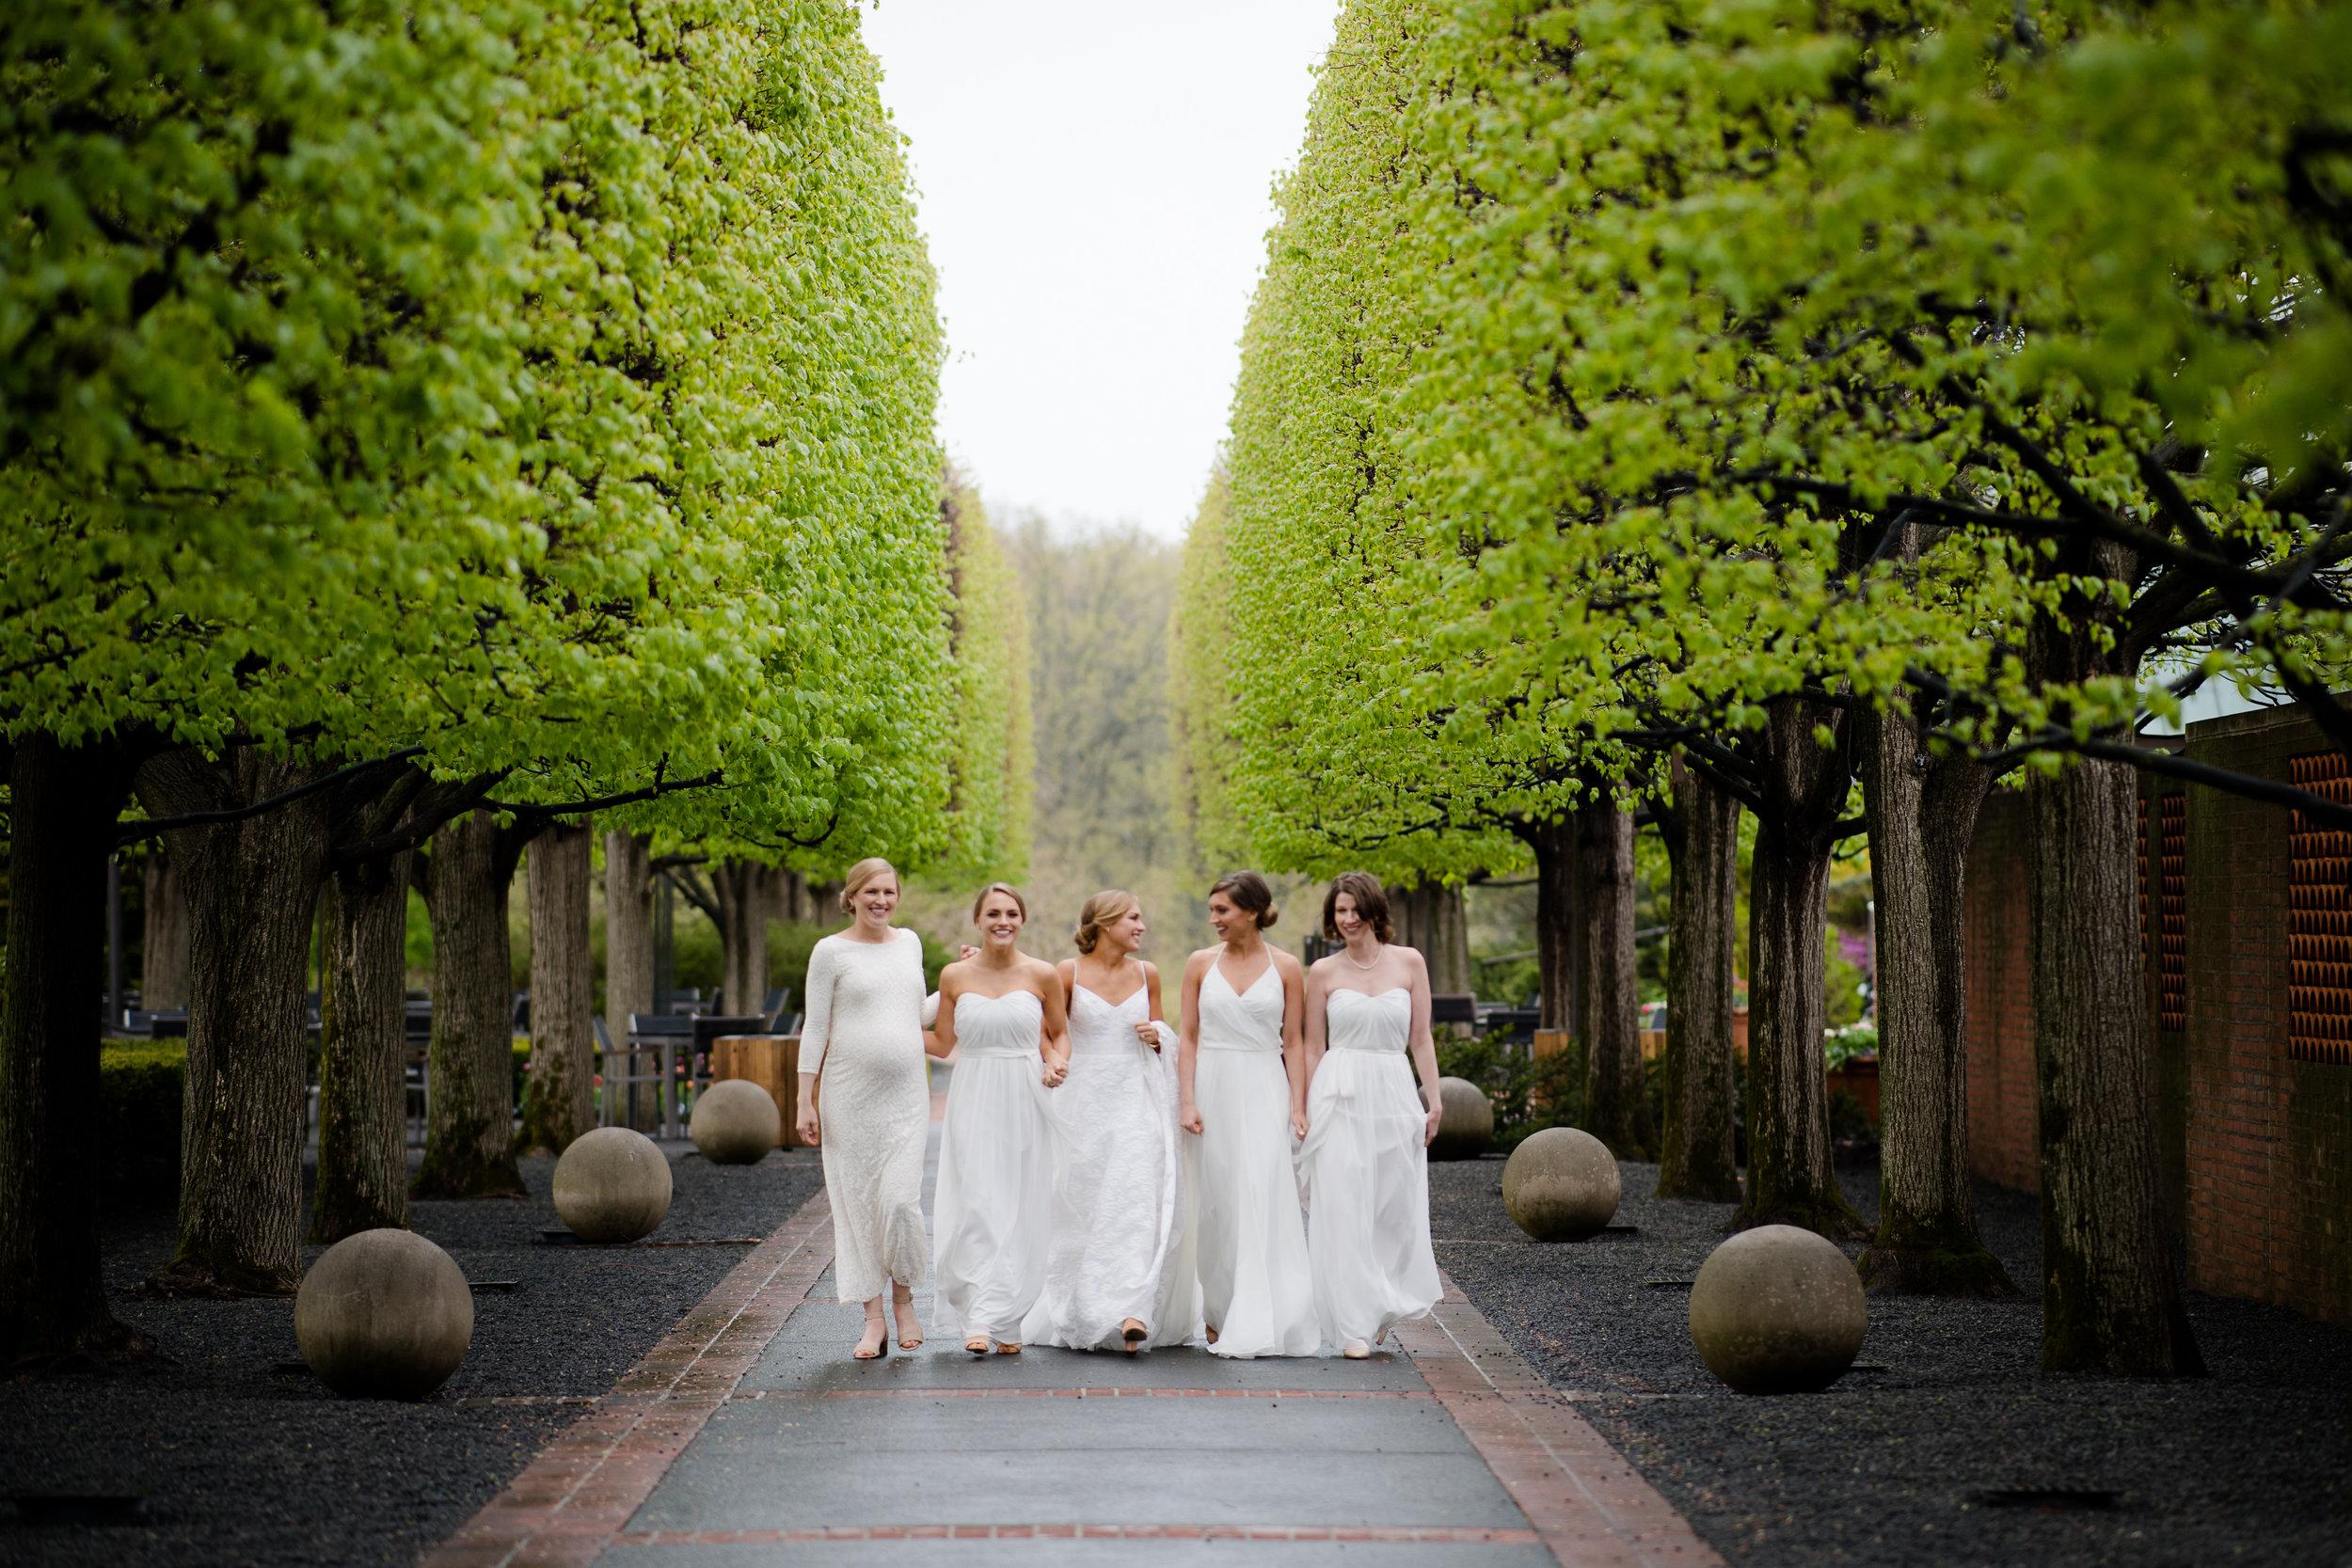 spring wedding at the chicago botanic garden23.jpg